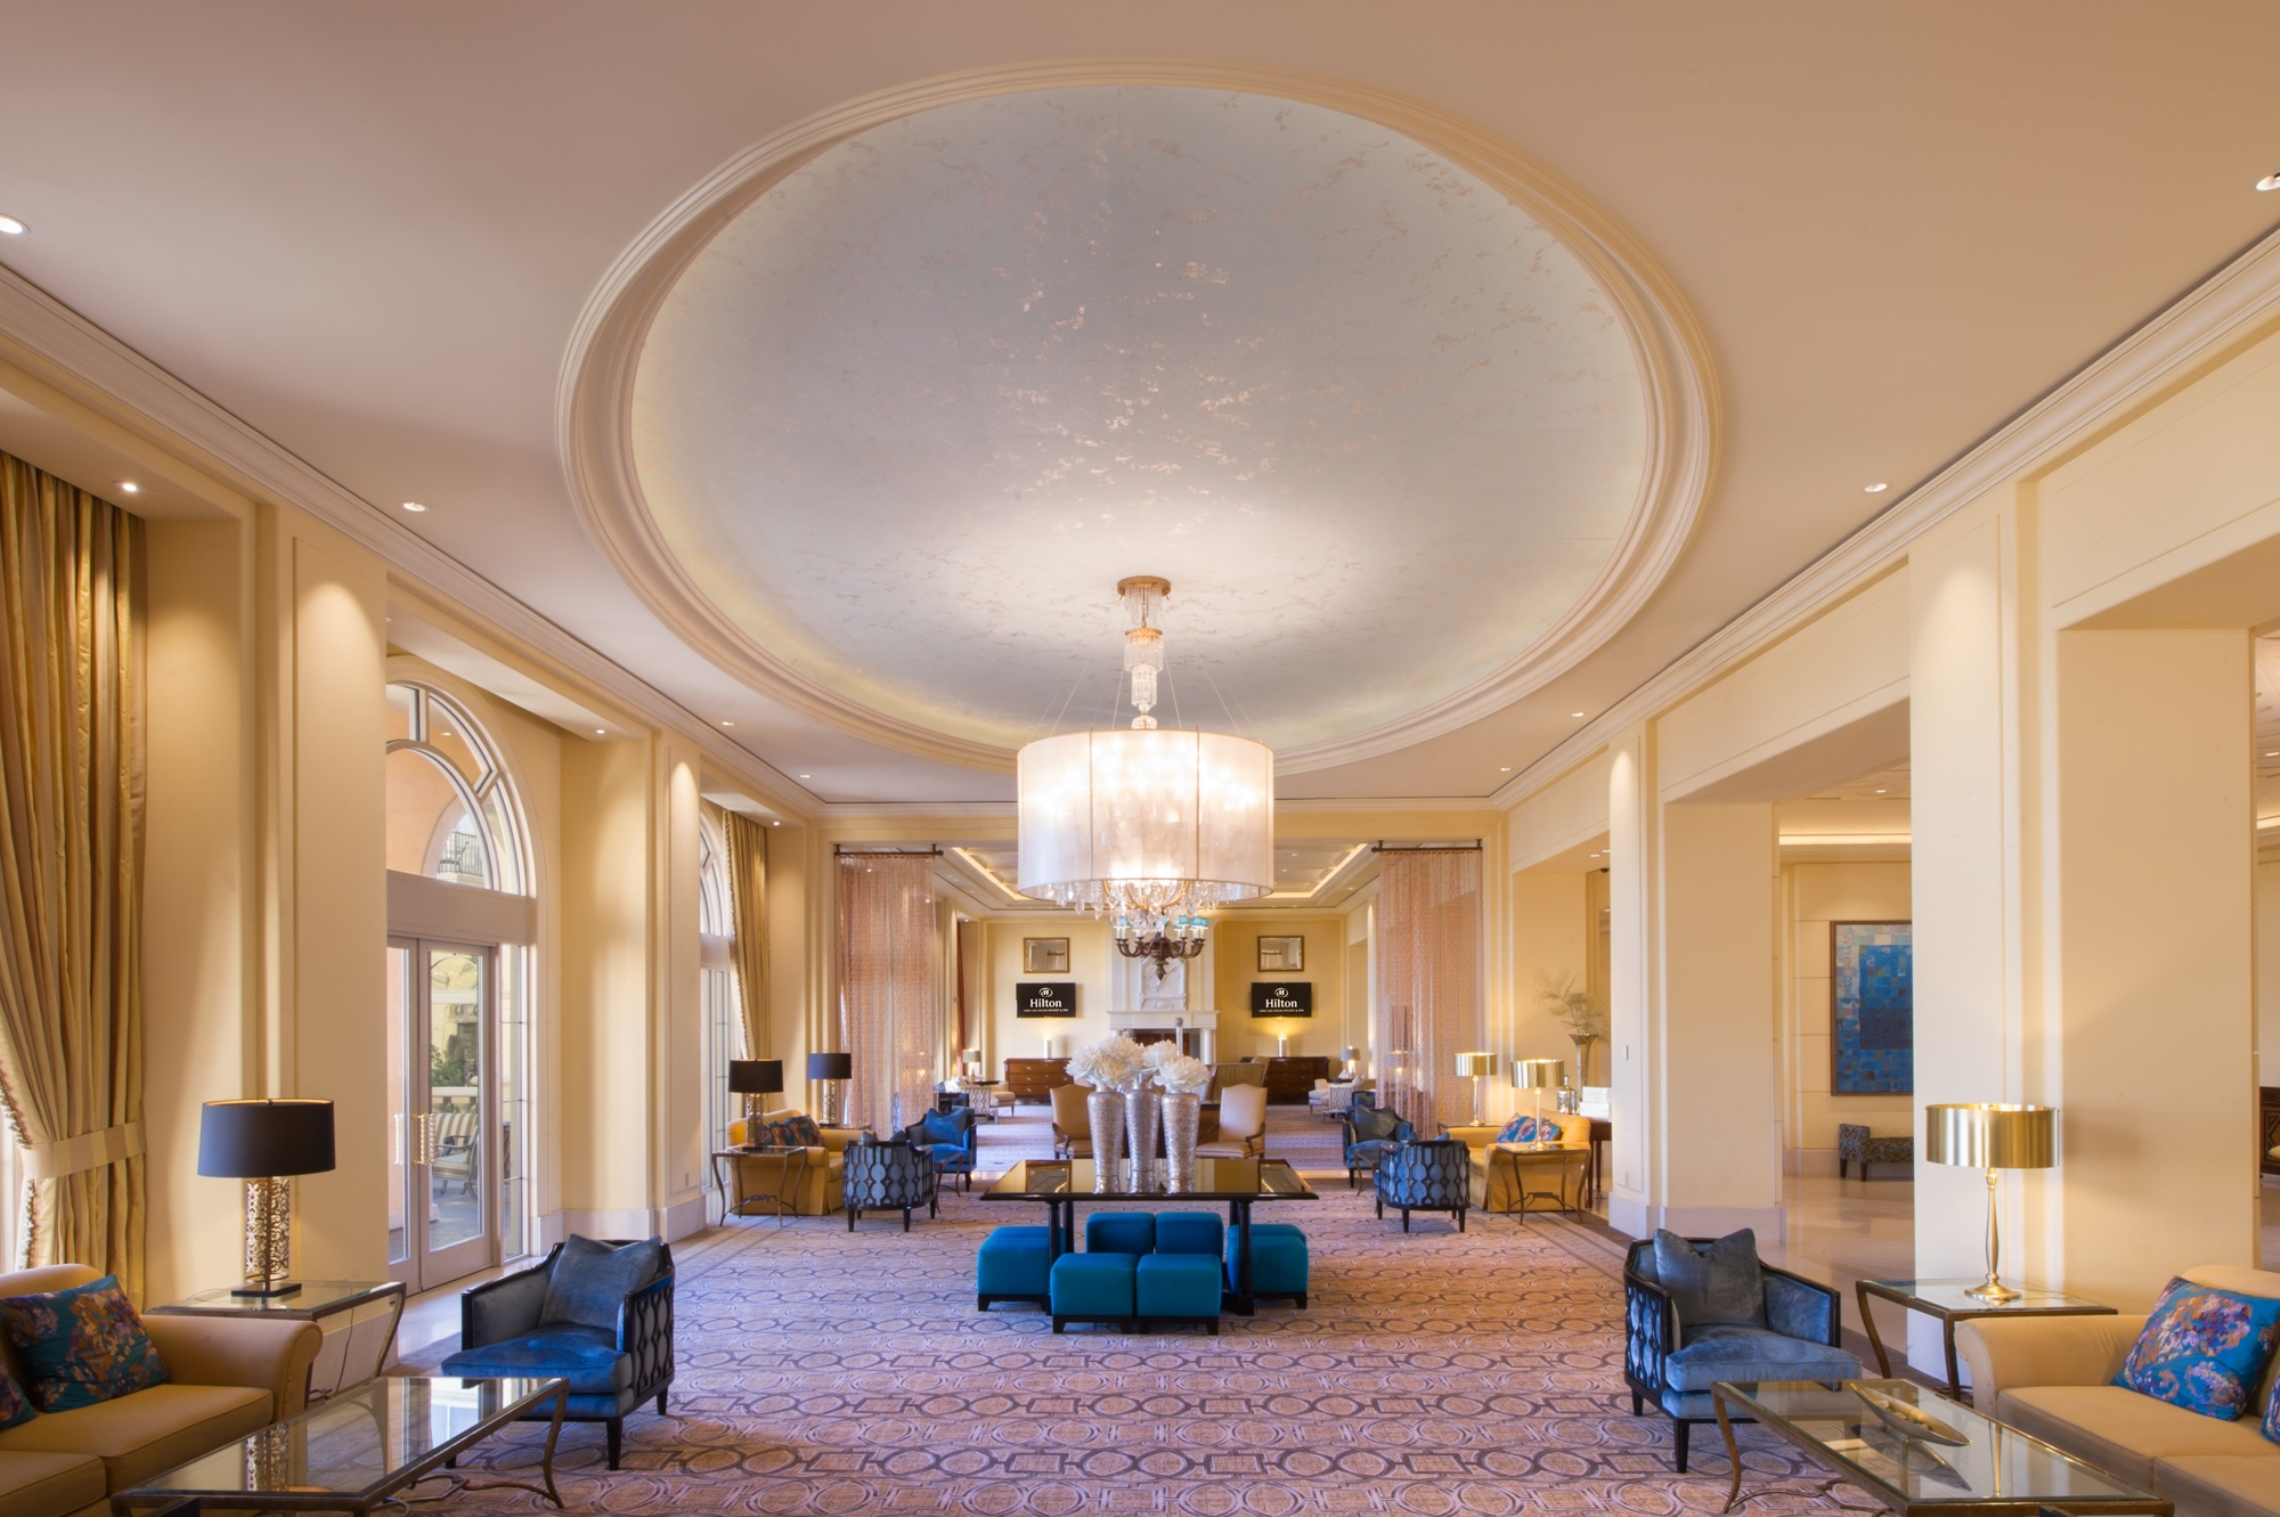 hilton lake las vegas resort spa in henderson nv. Black Bedroom Furniture Sets. Home Design Ideas